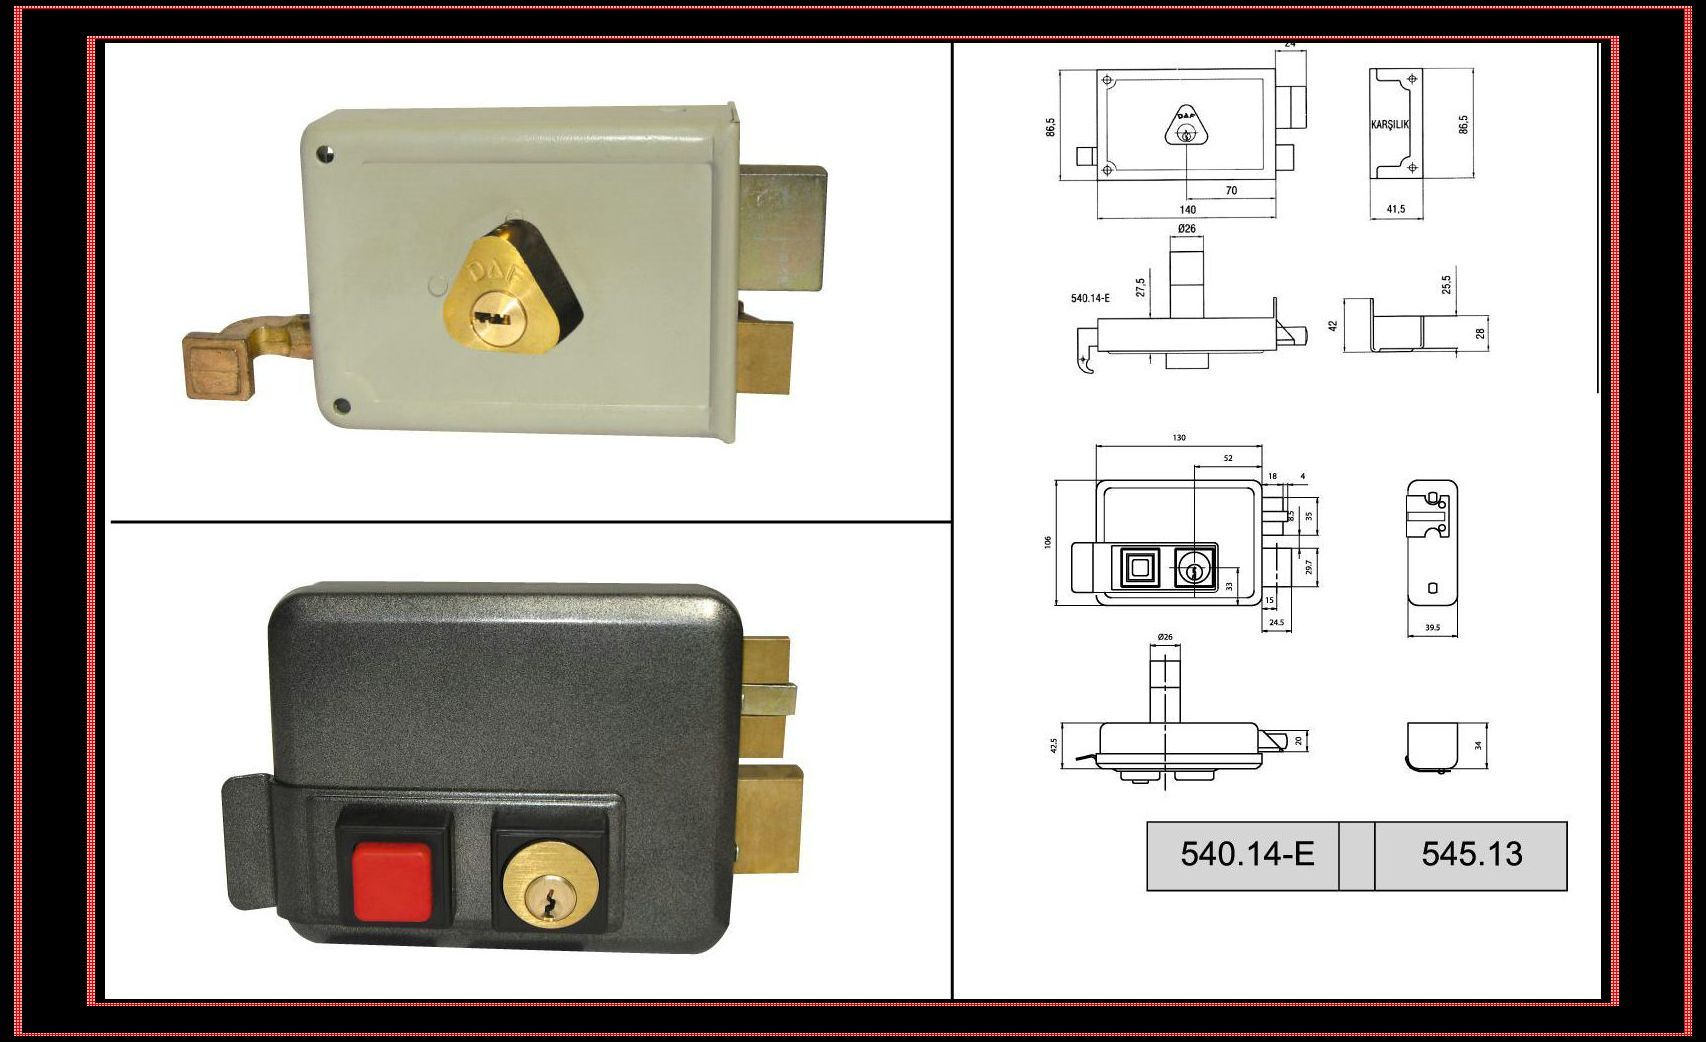 Amazon.com: Lock Jaw Security 1001 Door Security Device, Polished